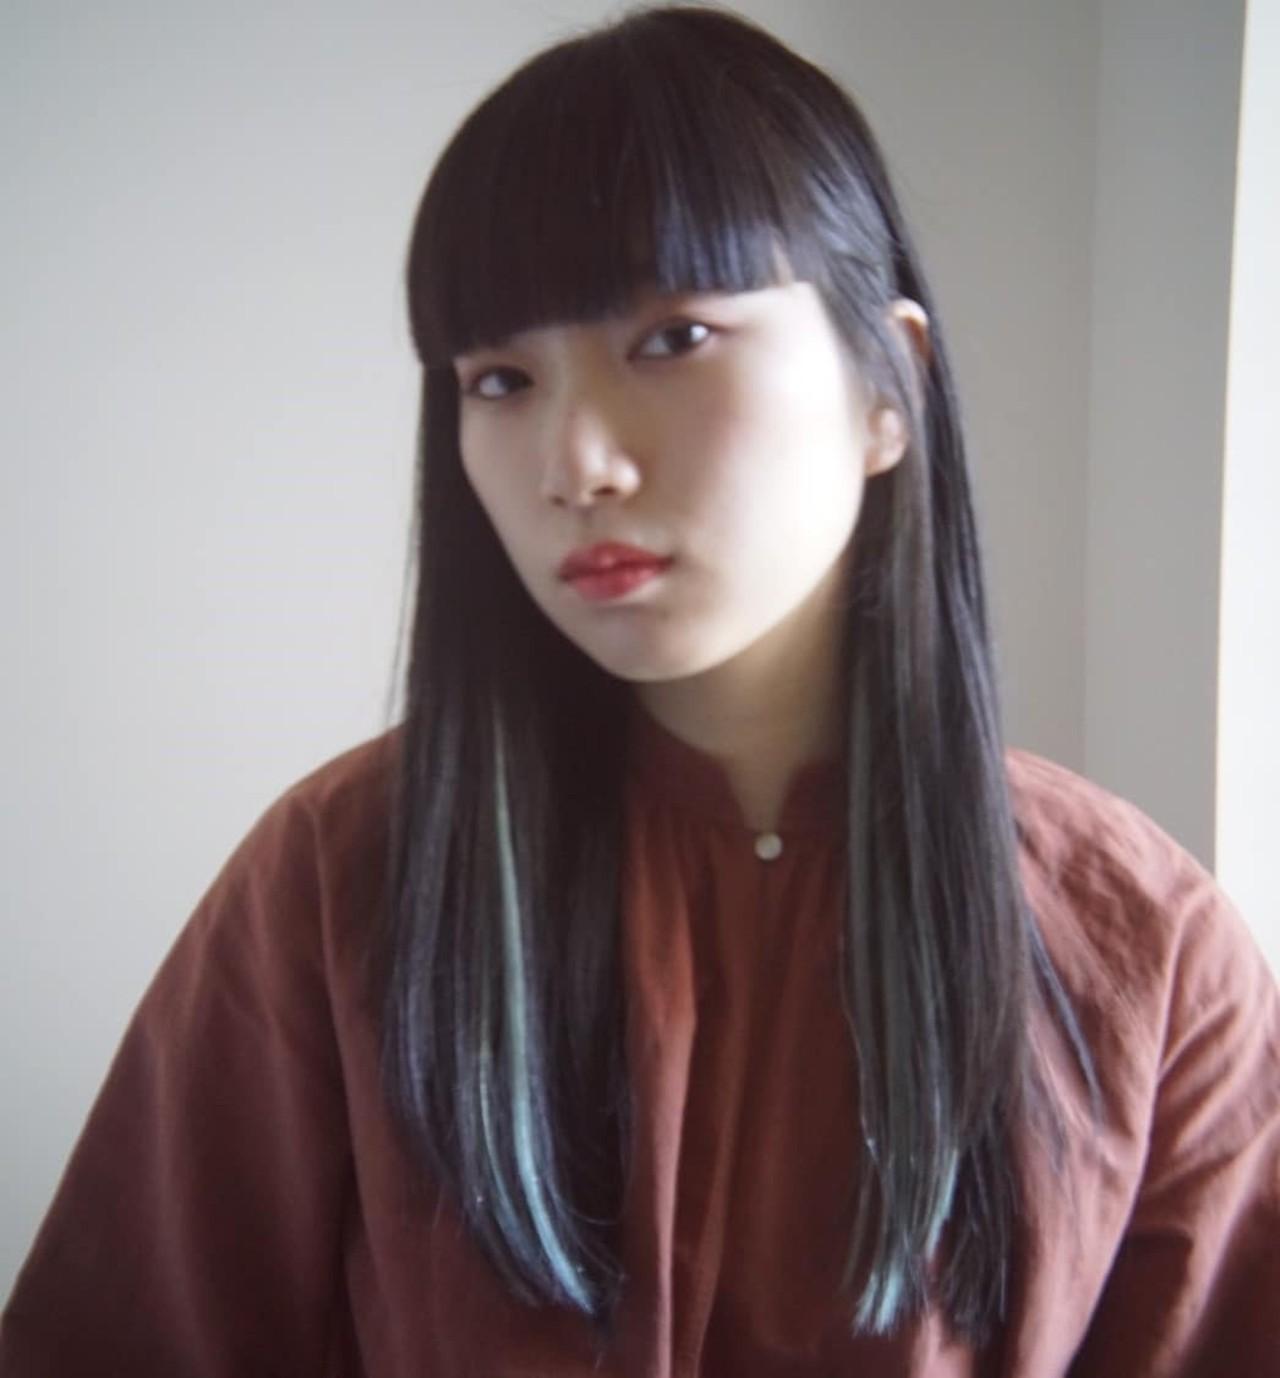 PEEK-A-BOO モード 阿藤俊也 似合わせカット ヘアスタイルや髪型の写真・画像